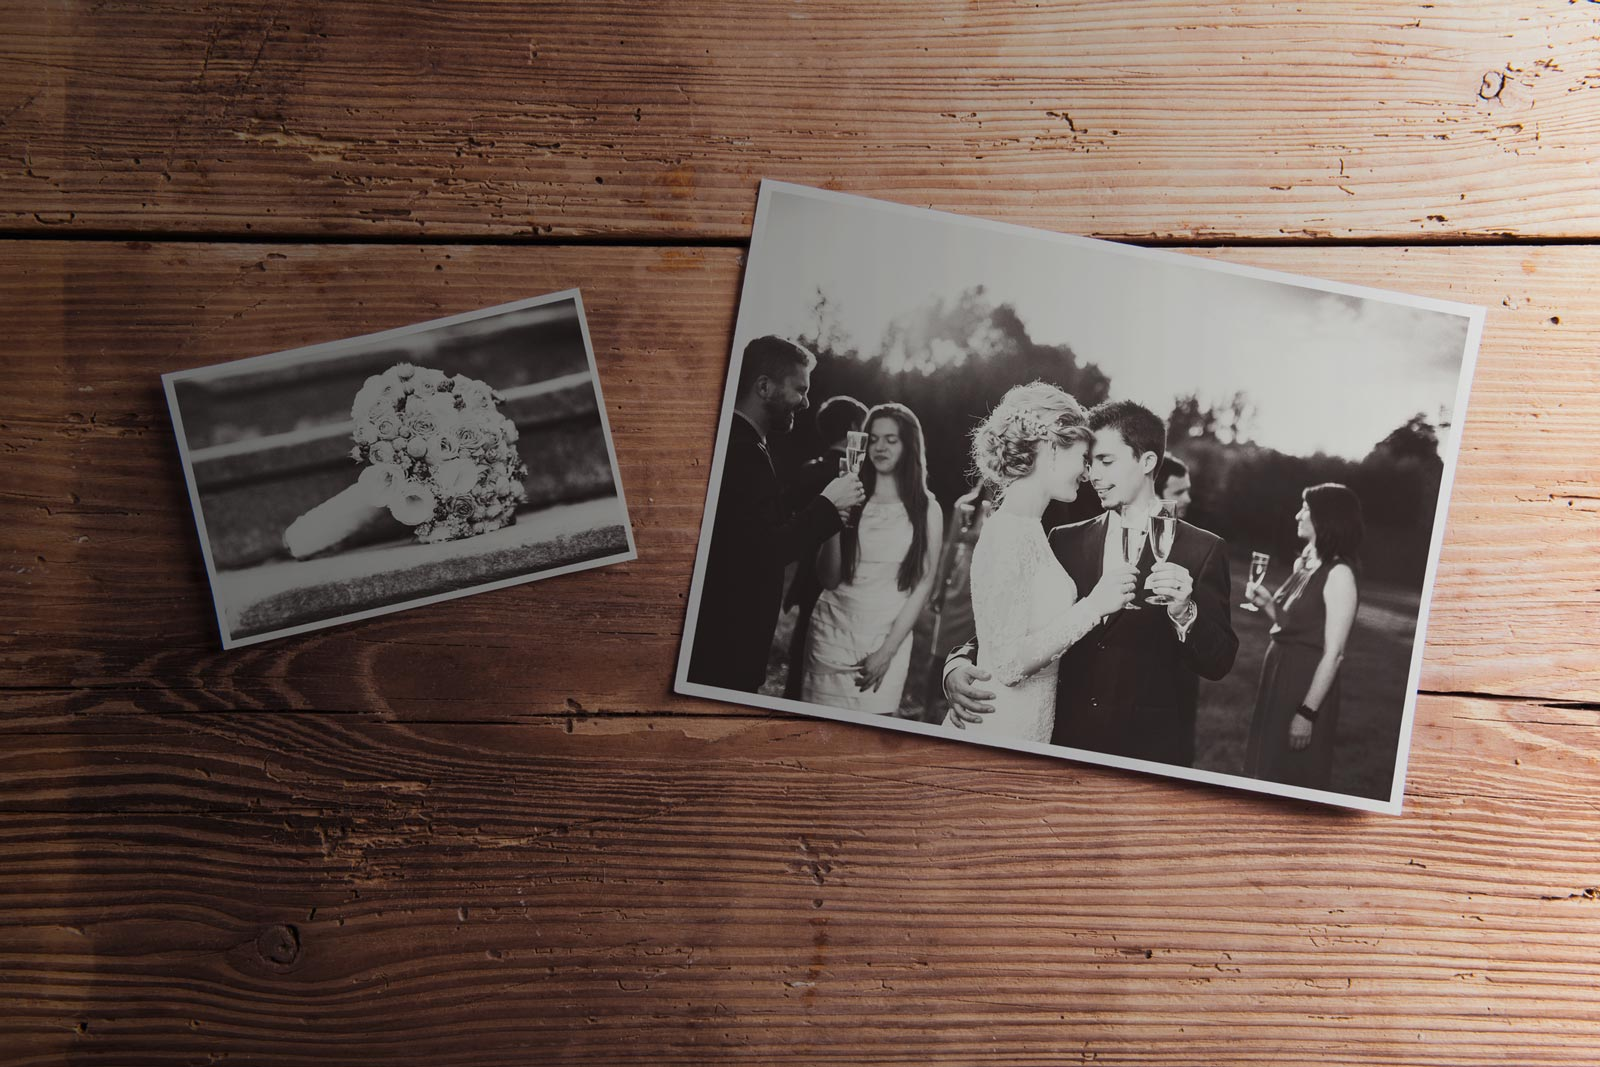 specials-slide-fotobox3-eshatklickgemacht